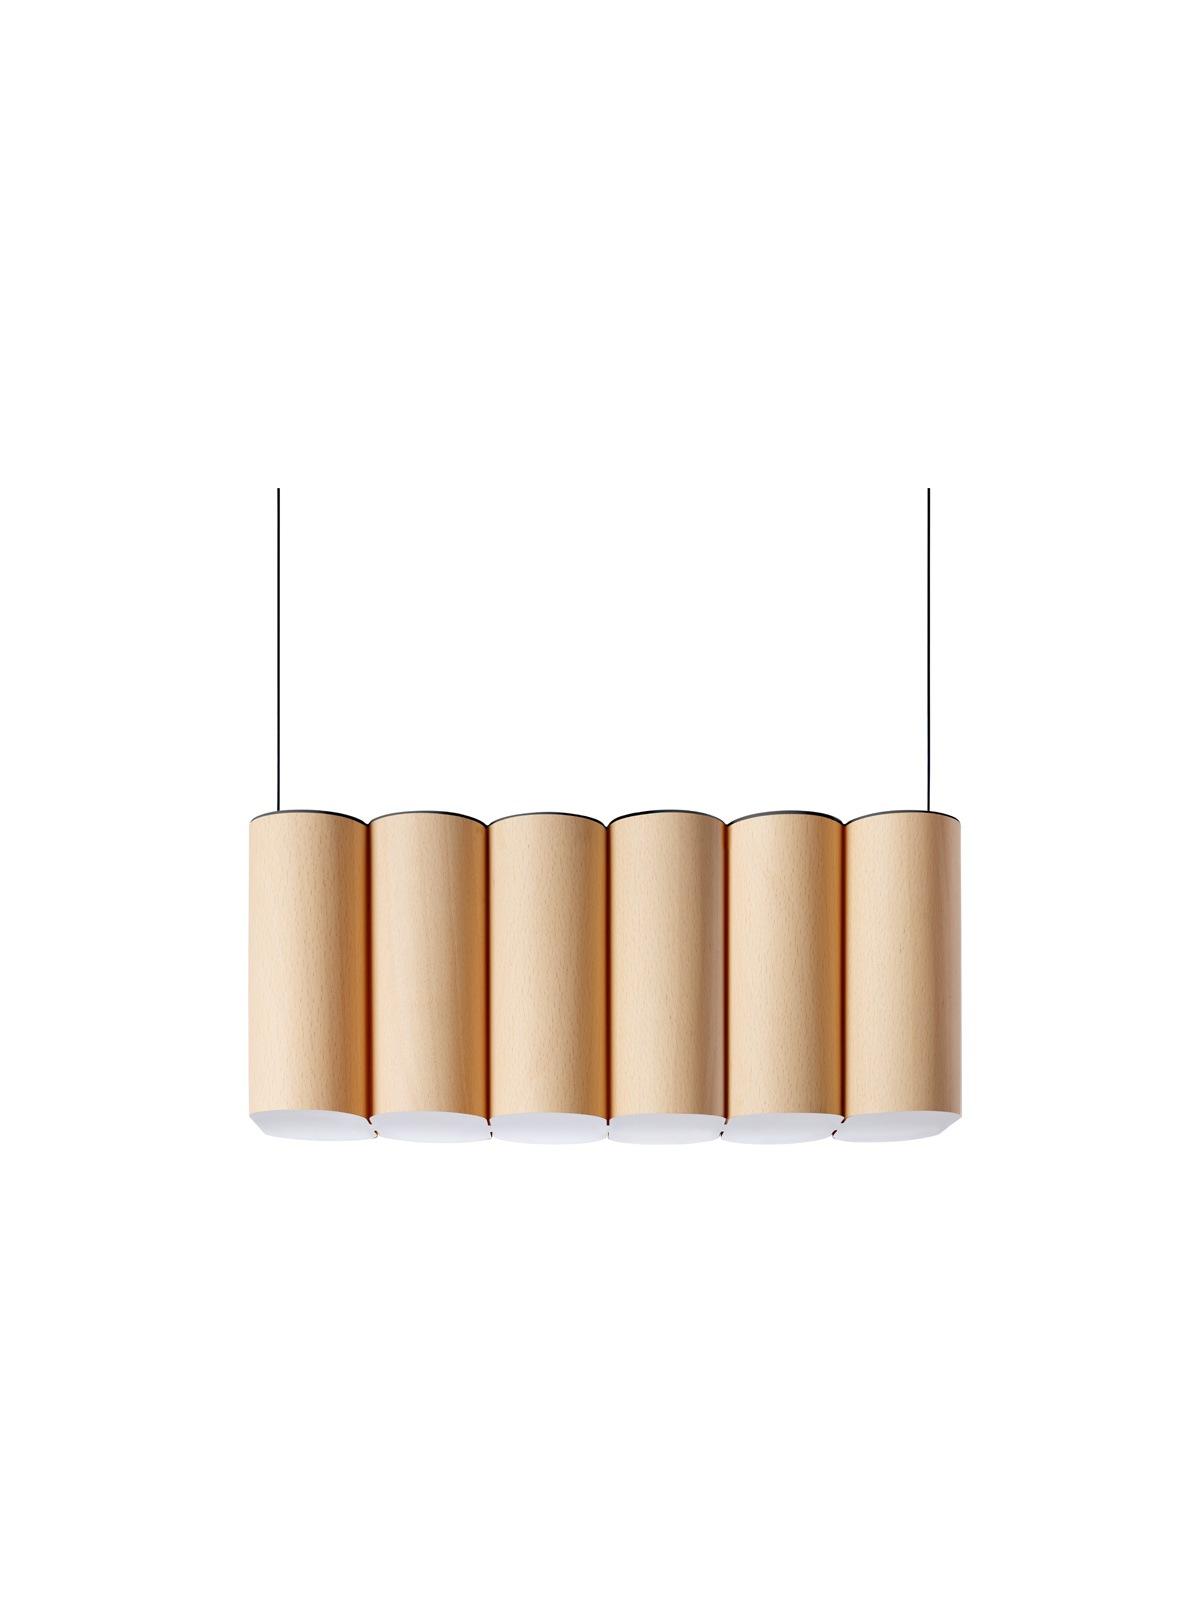 Tomo Long LZF Lamps Designort Leuchten Berlin